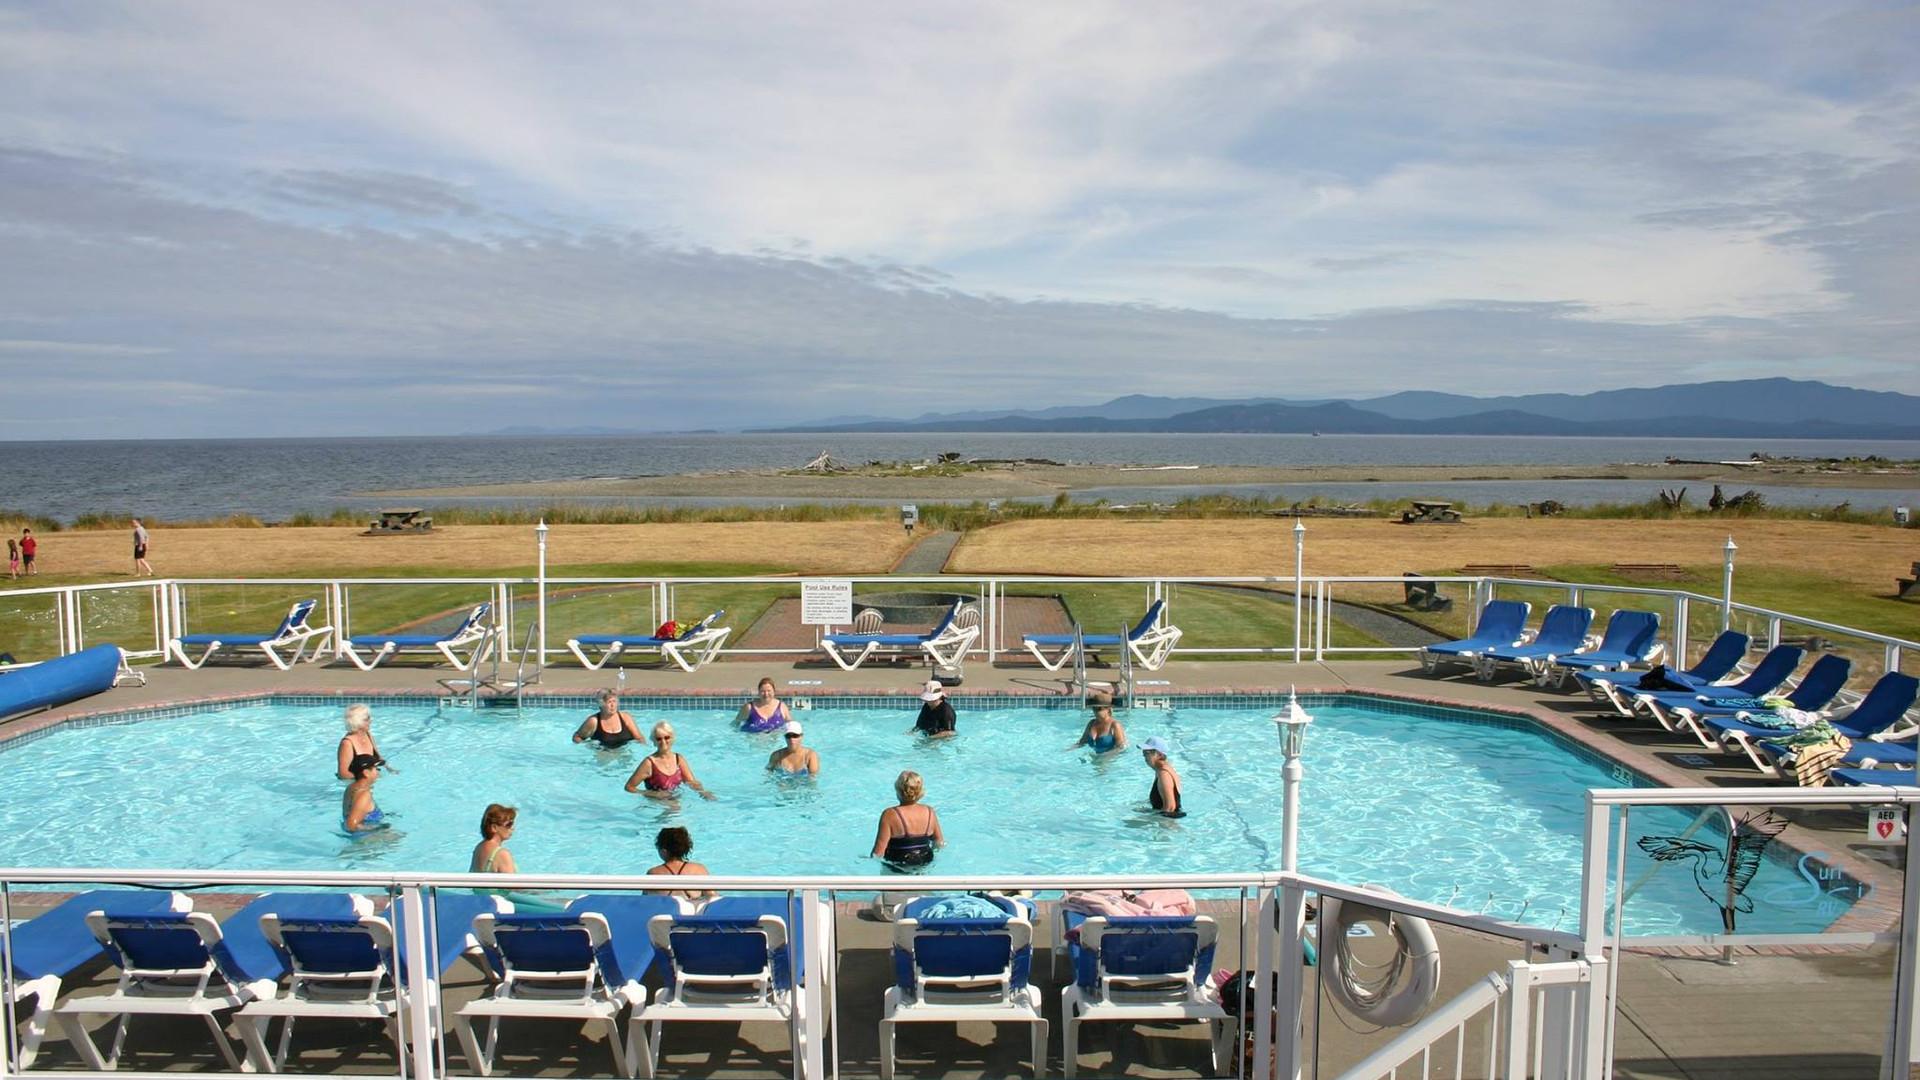 pool_Surfside_rv_resort-campground.jpg